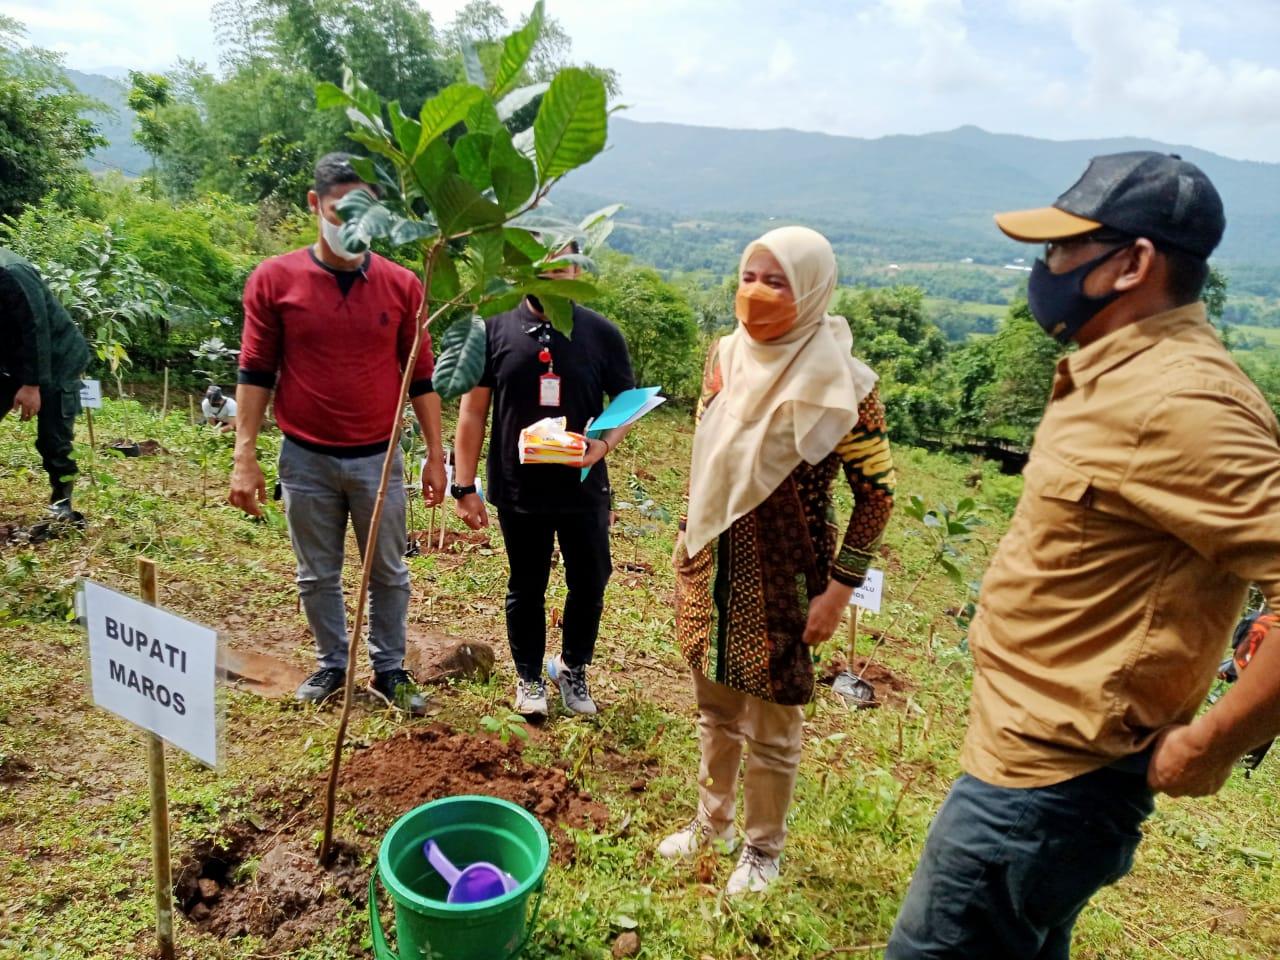 Hari Bakti Rimbawan Ke-38 Tahun 2021 Dipusatkan di Kecamatan Tompo Bulu